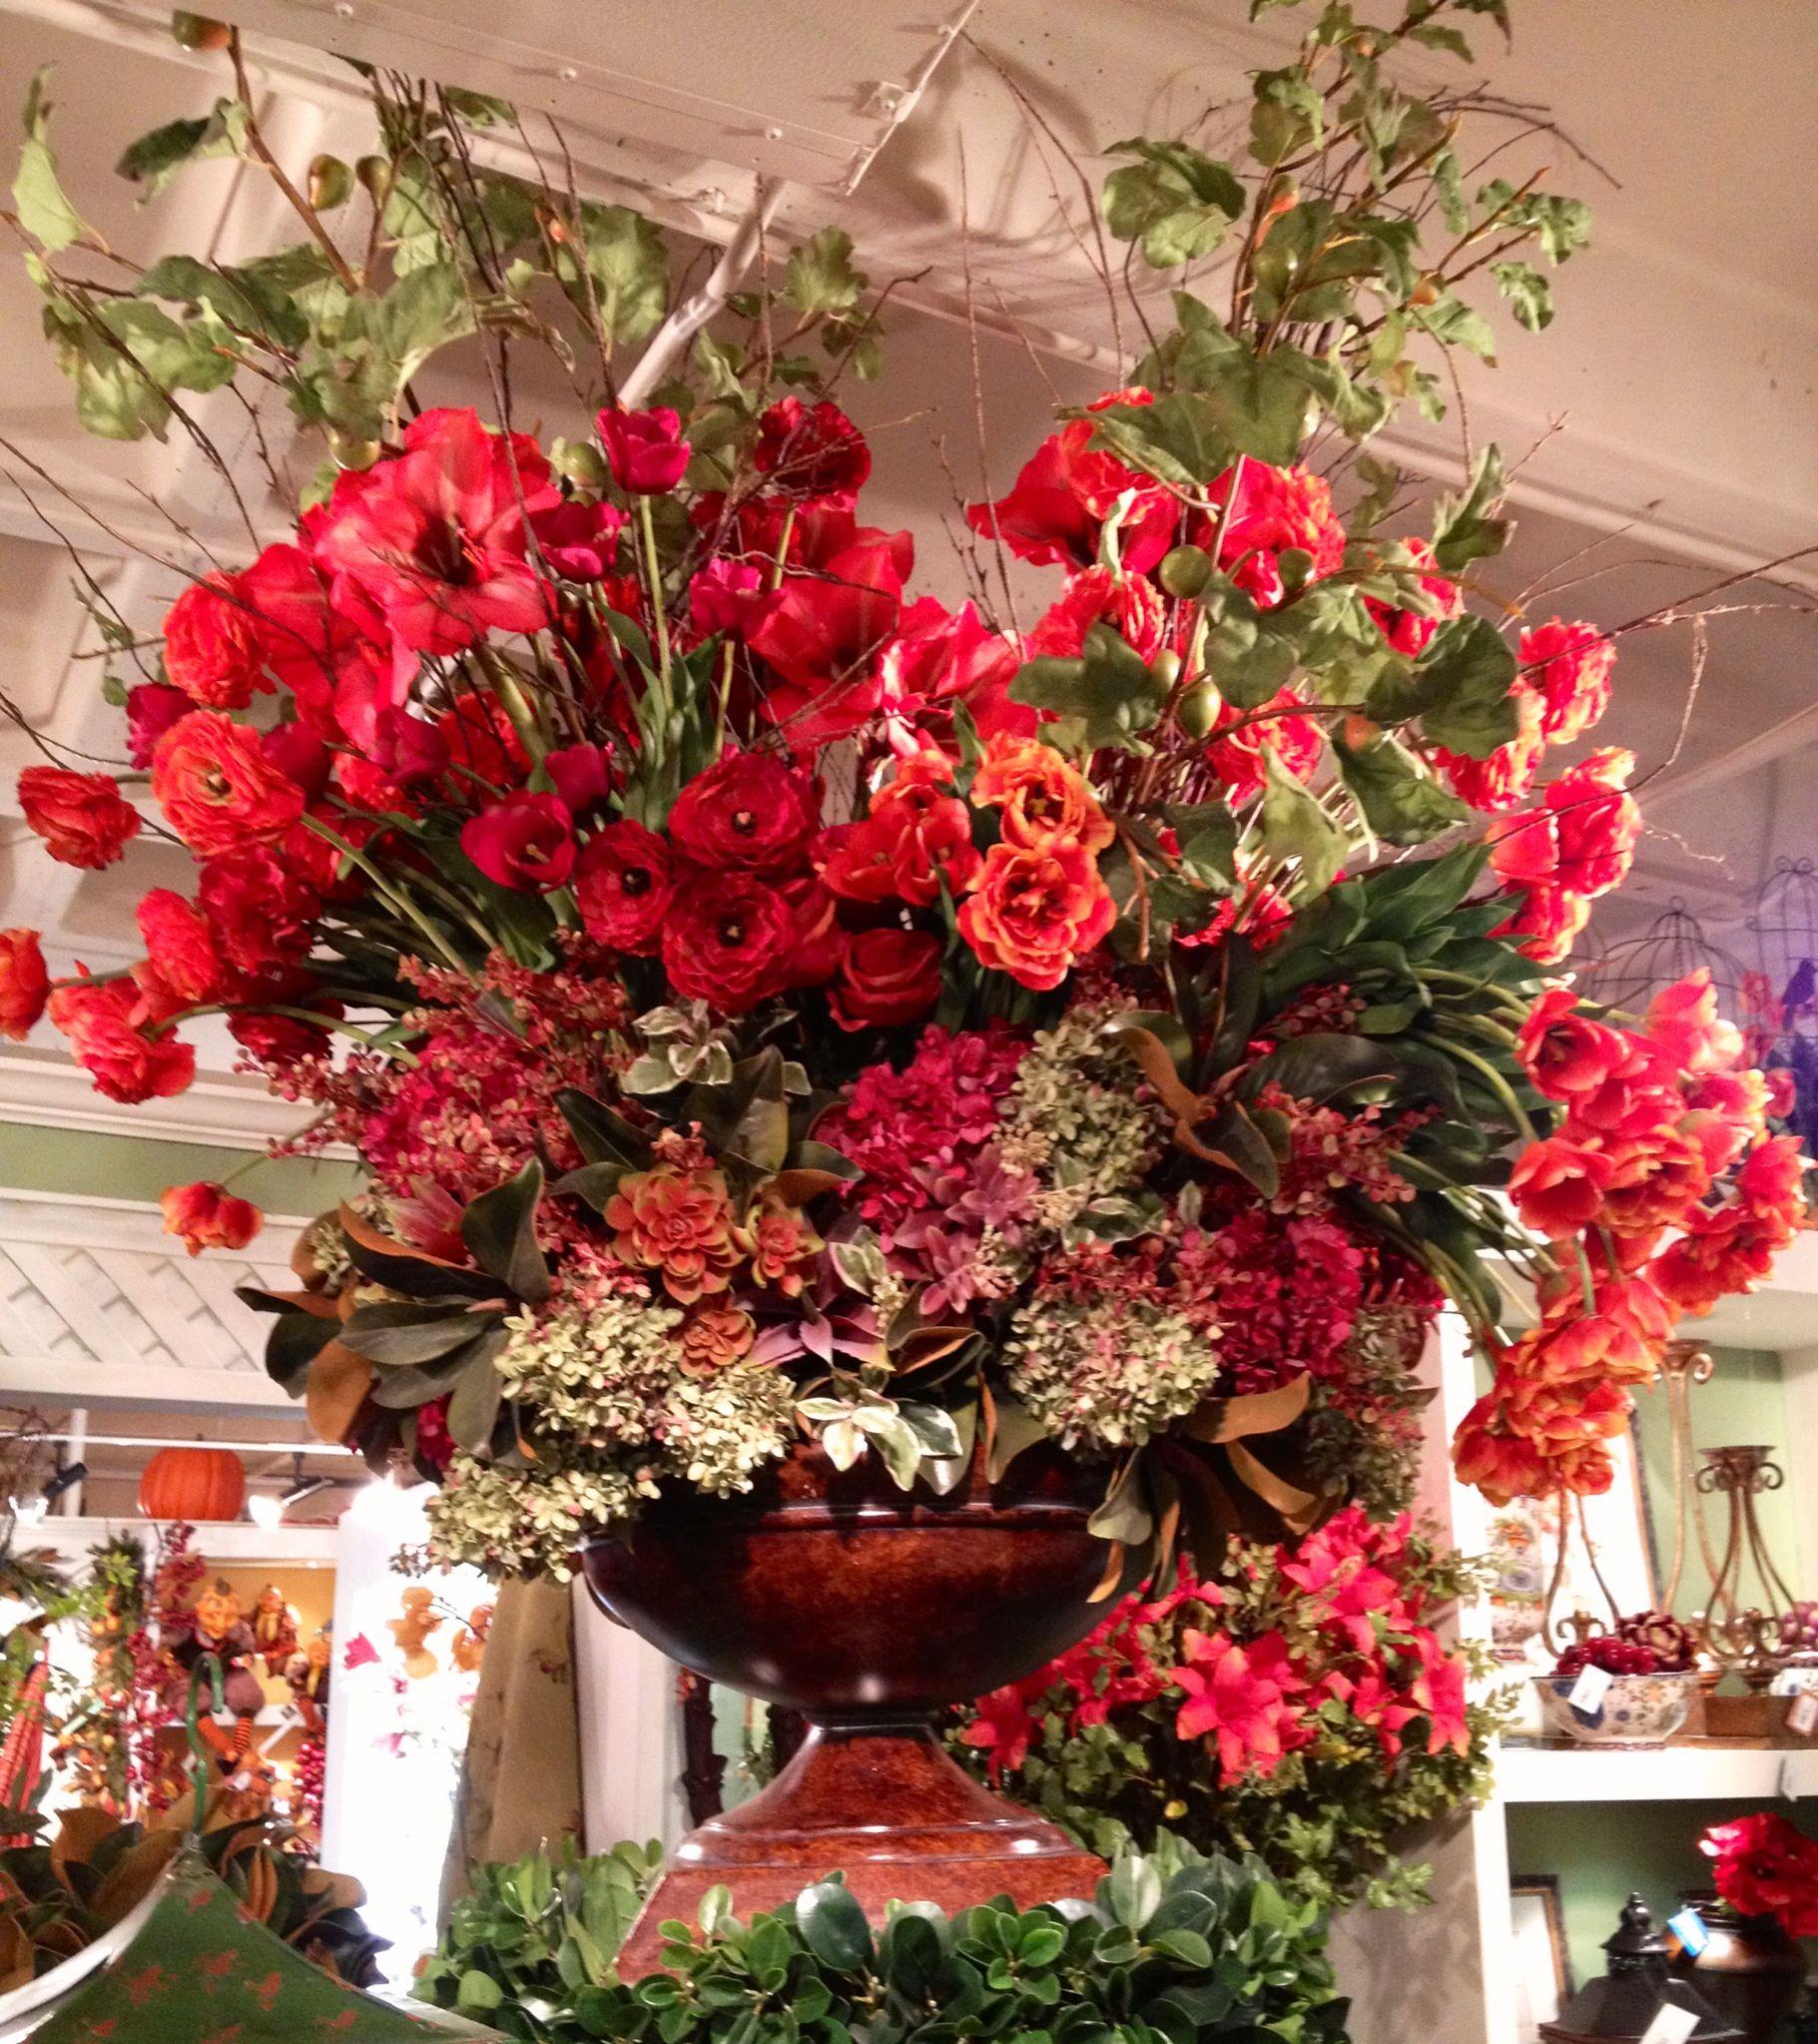 Beautiful large red floral arrangement